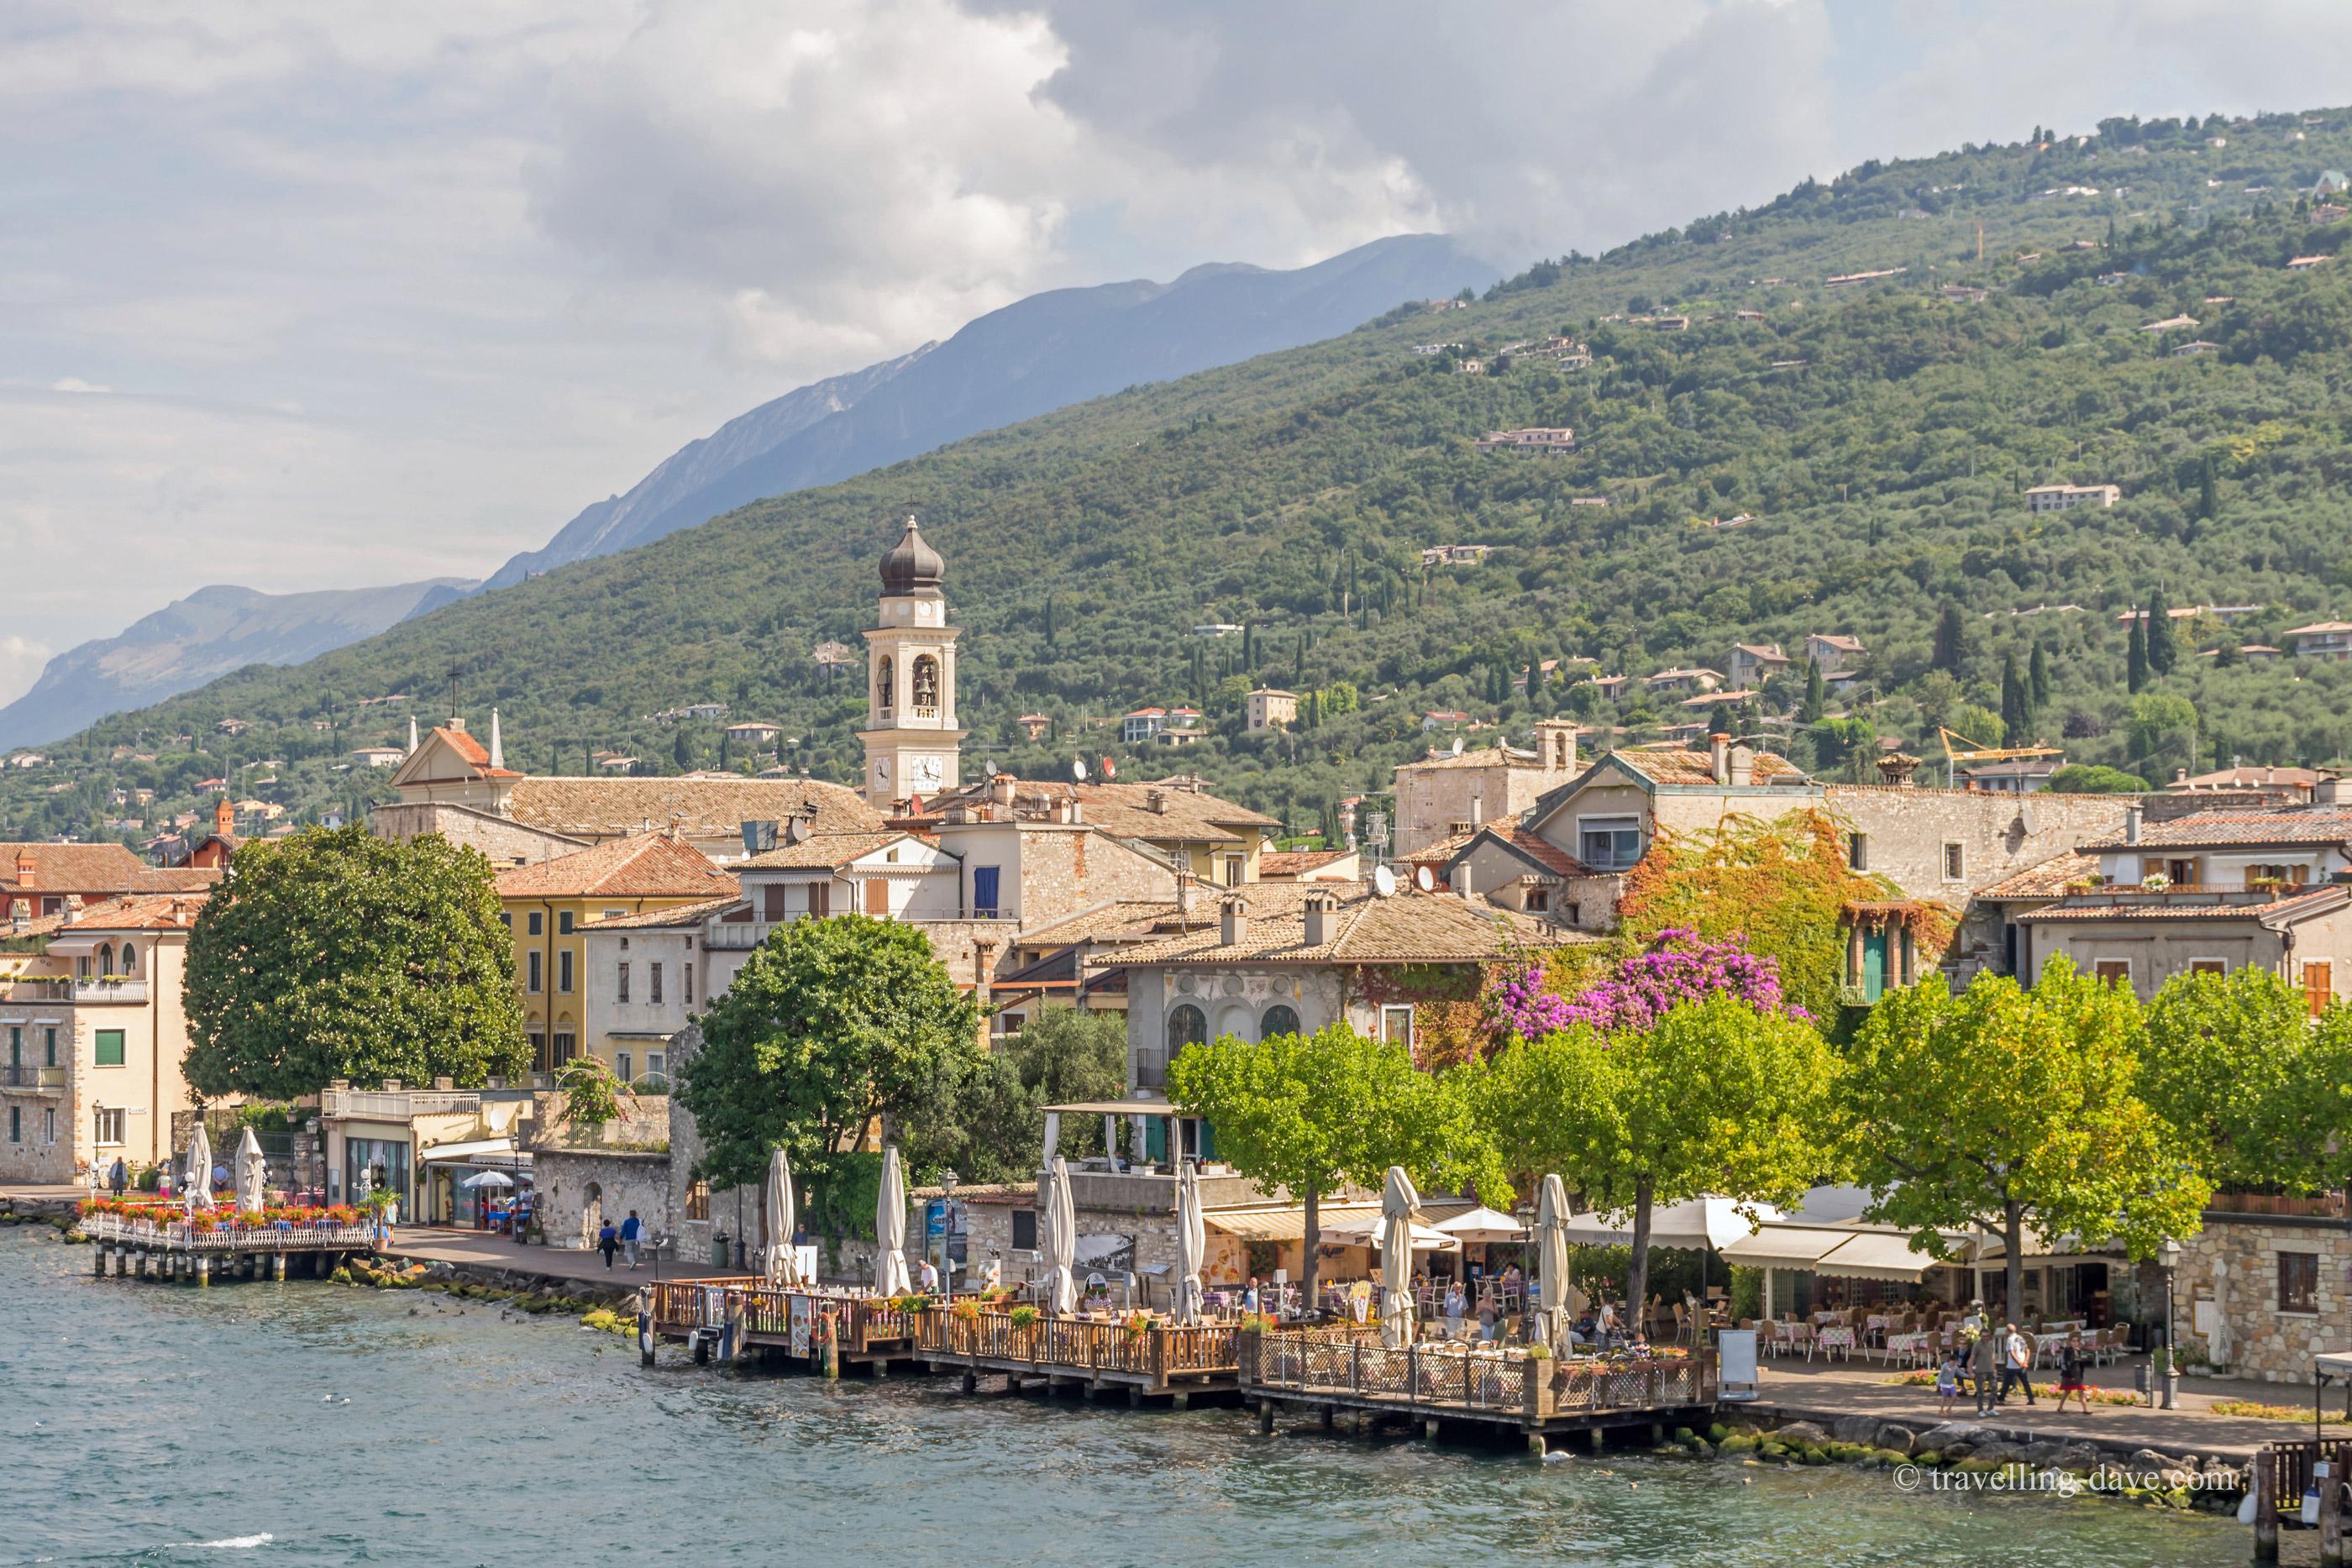 Panoramic view of the village of Torri del Benaco in Italy